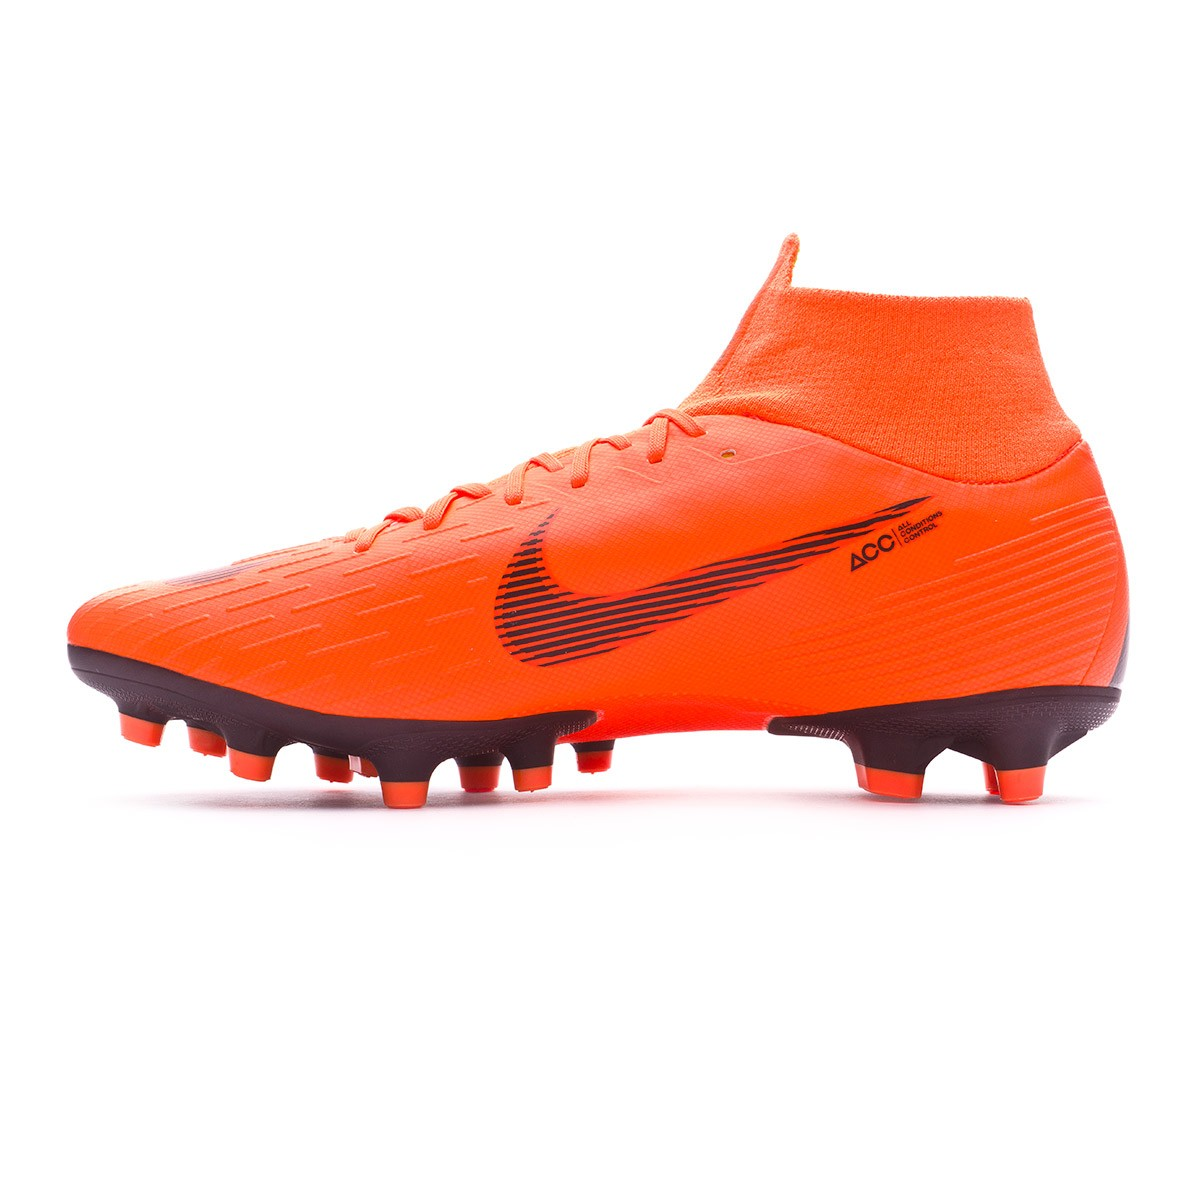 04914b37184 Football Boots Nike Mercurial Superfly VI Pro AG-Pro Total orange-Black-Volt  - Football store Fútbol Emotion